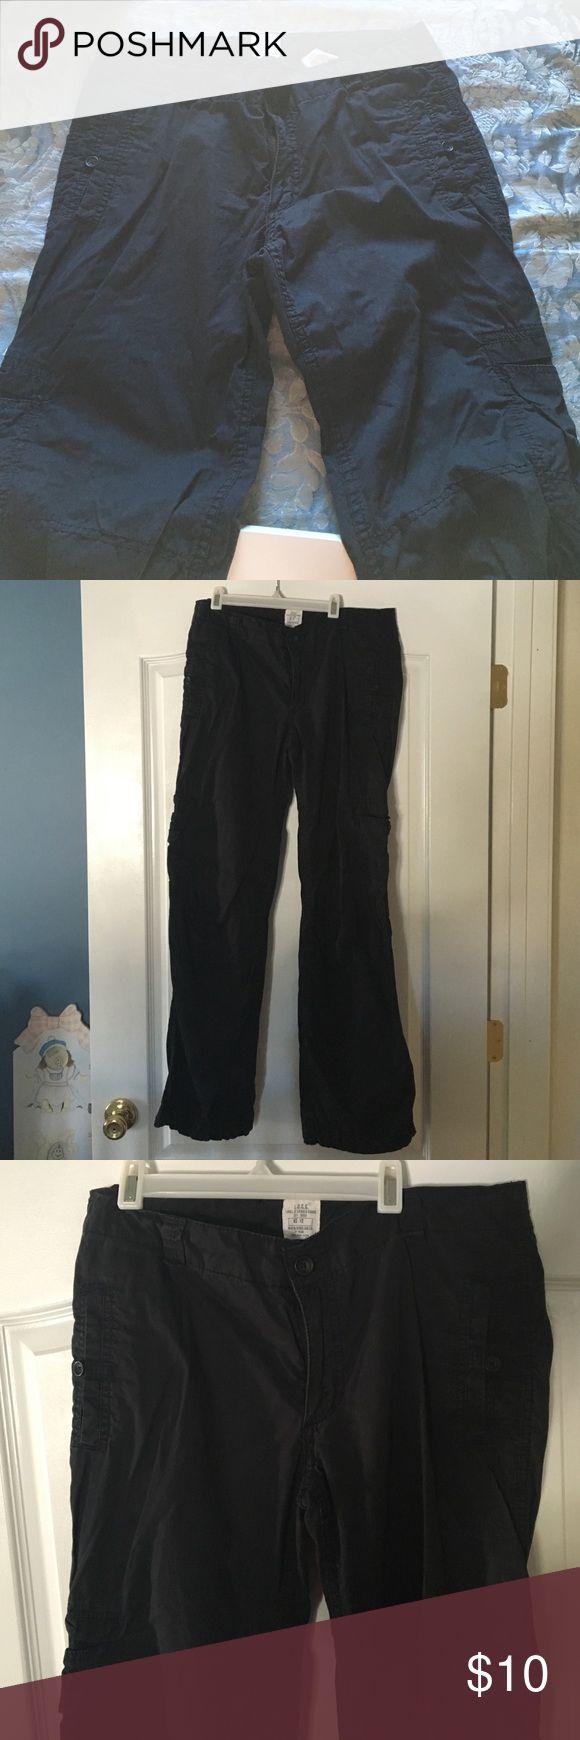 Black khaki pants Black khaki pants in great condition from H&M H&M Pants